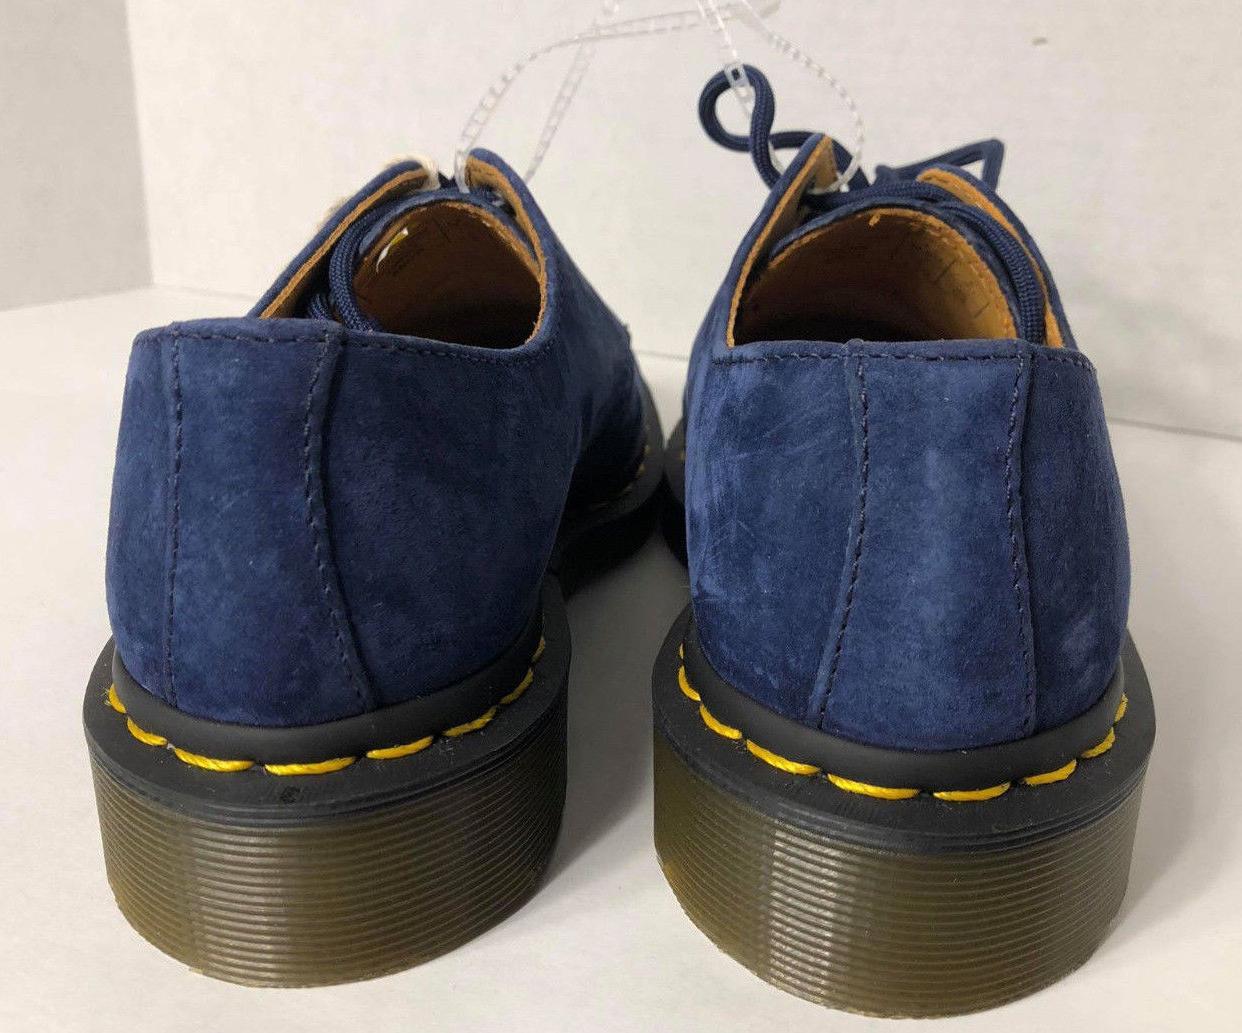 NEW Martens Womens 5 Men 4 Classic 3Eye Oxford Shoes Blue $120